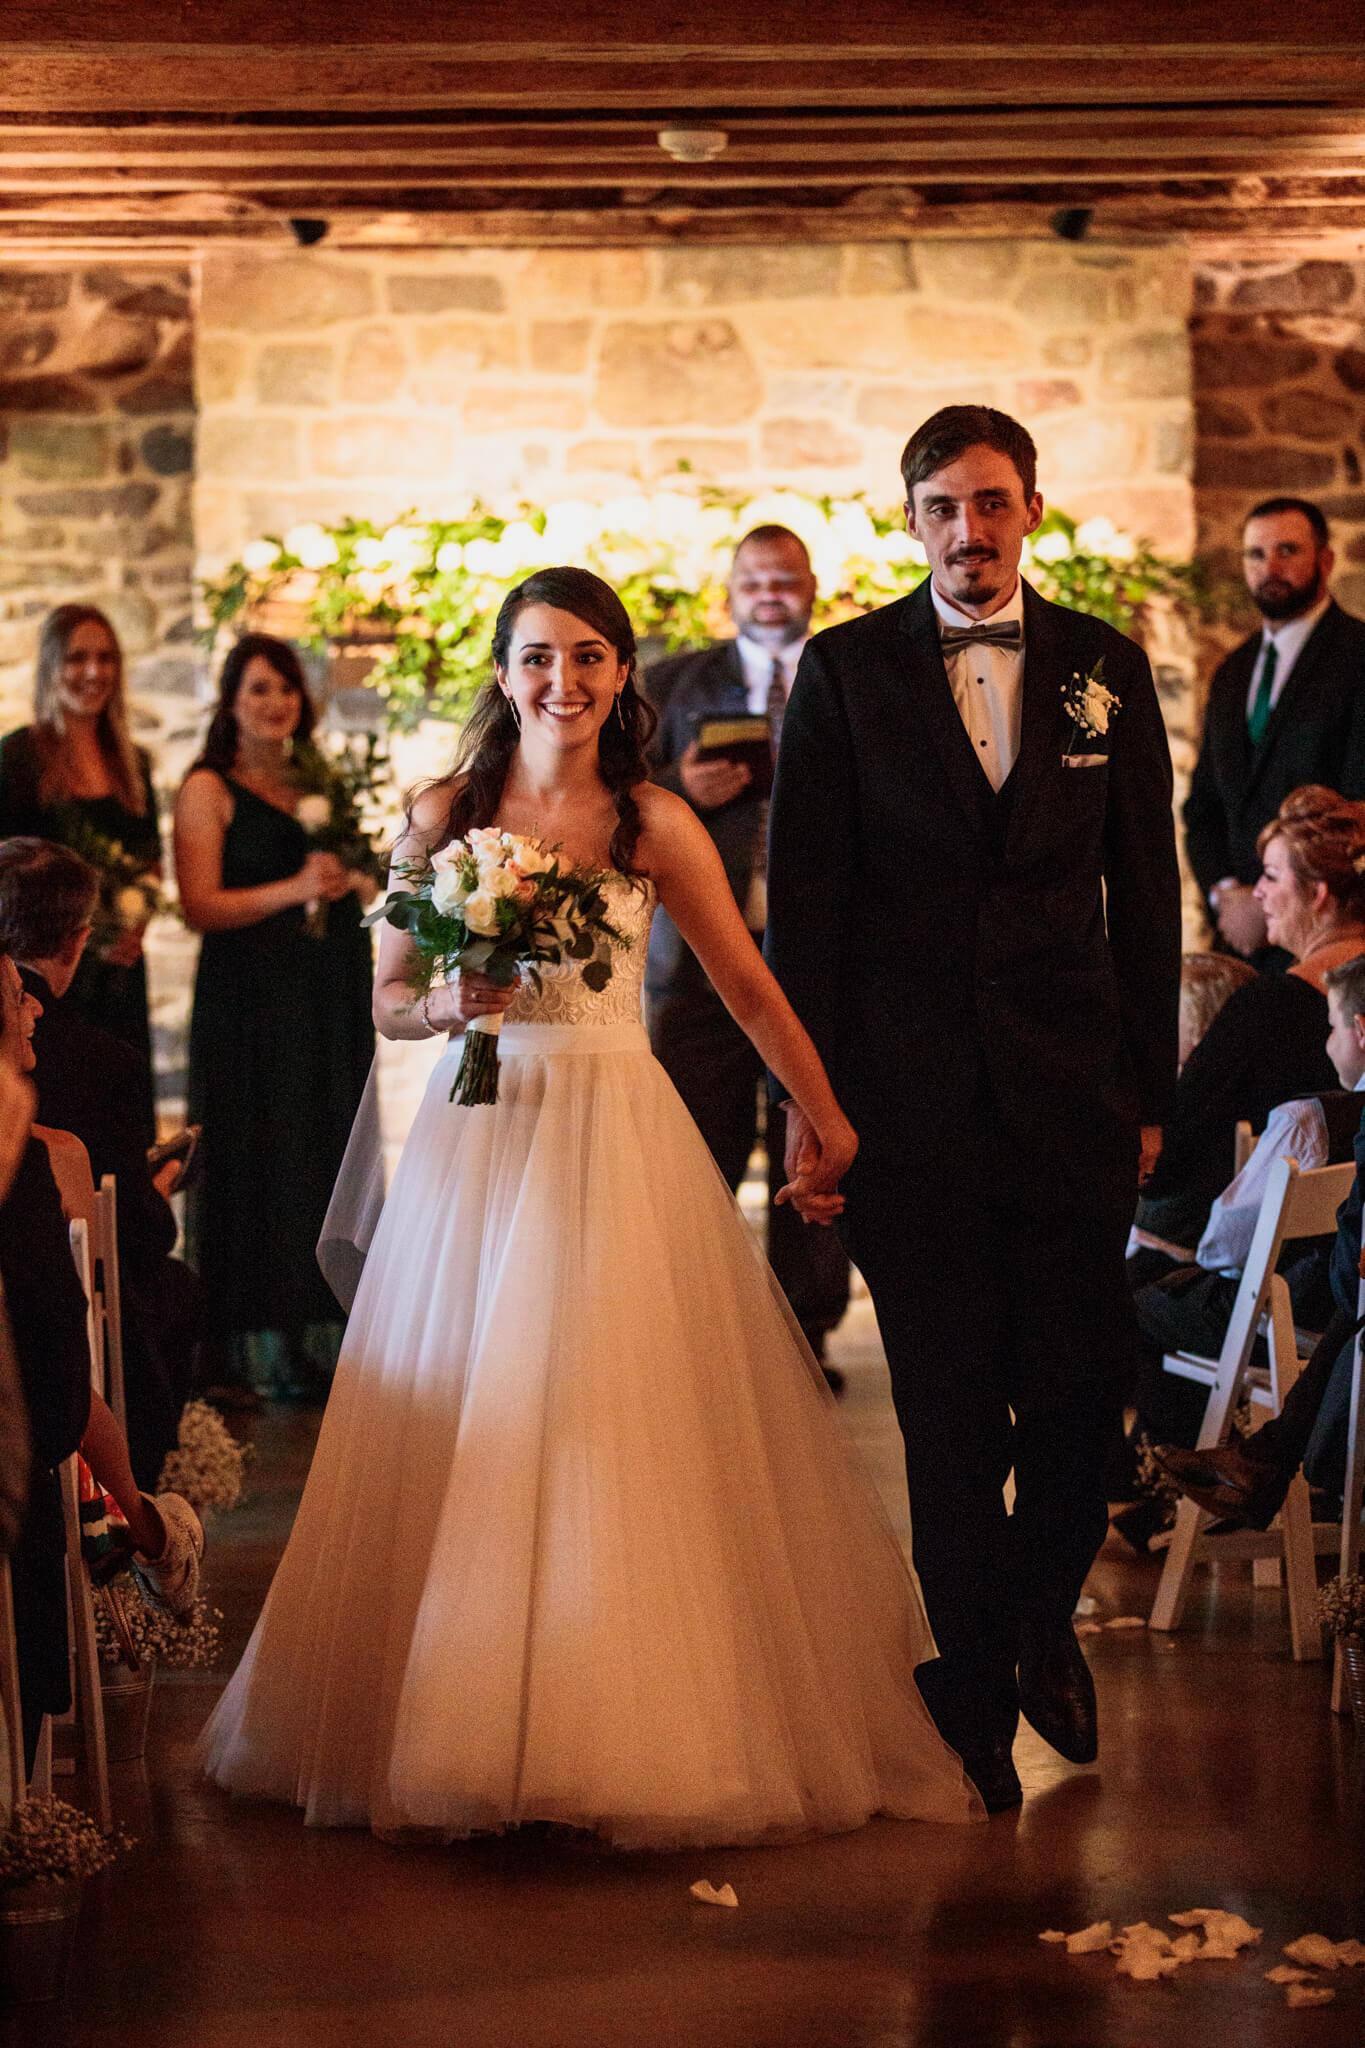 Alysia Jerad Homestead Blessings Farm Hershey PA Wedding Rustic Chique - 70.JPG